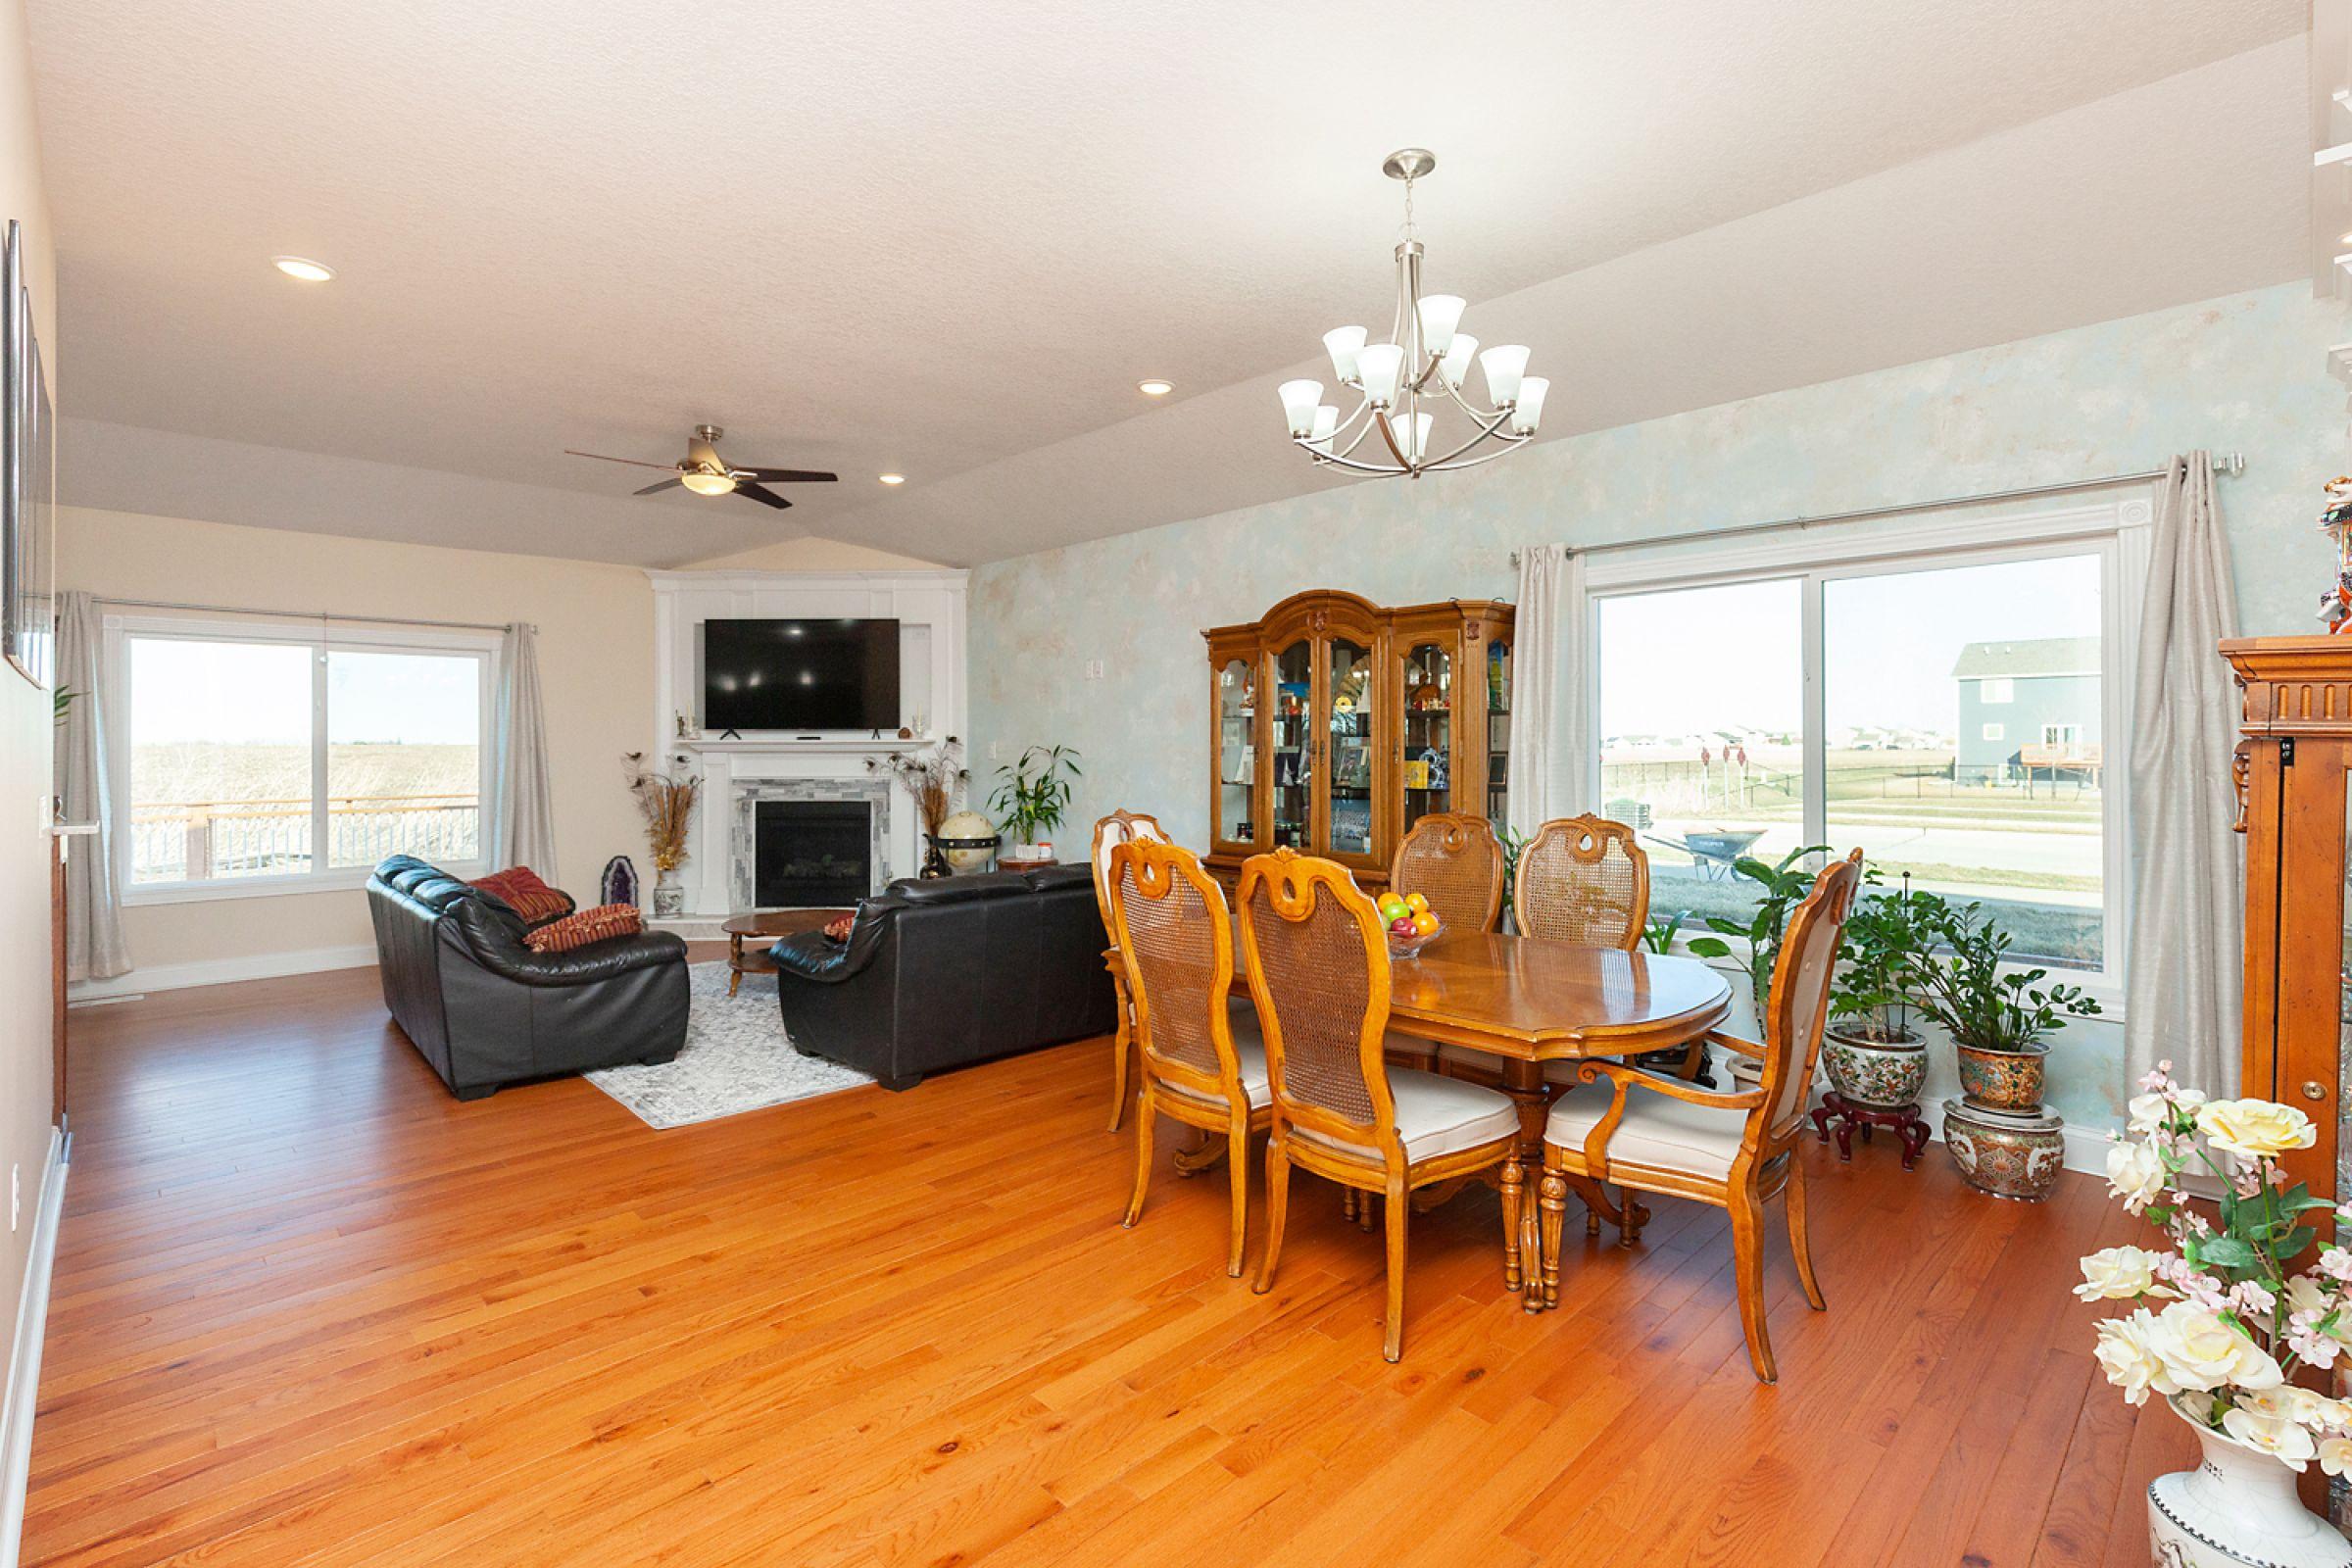 residential-polk-county-iowa-0-acres-listing-number-15403-0-2021-03-12-053205.jpg